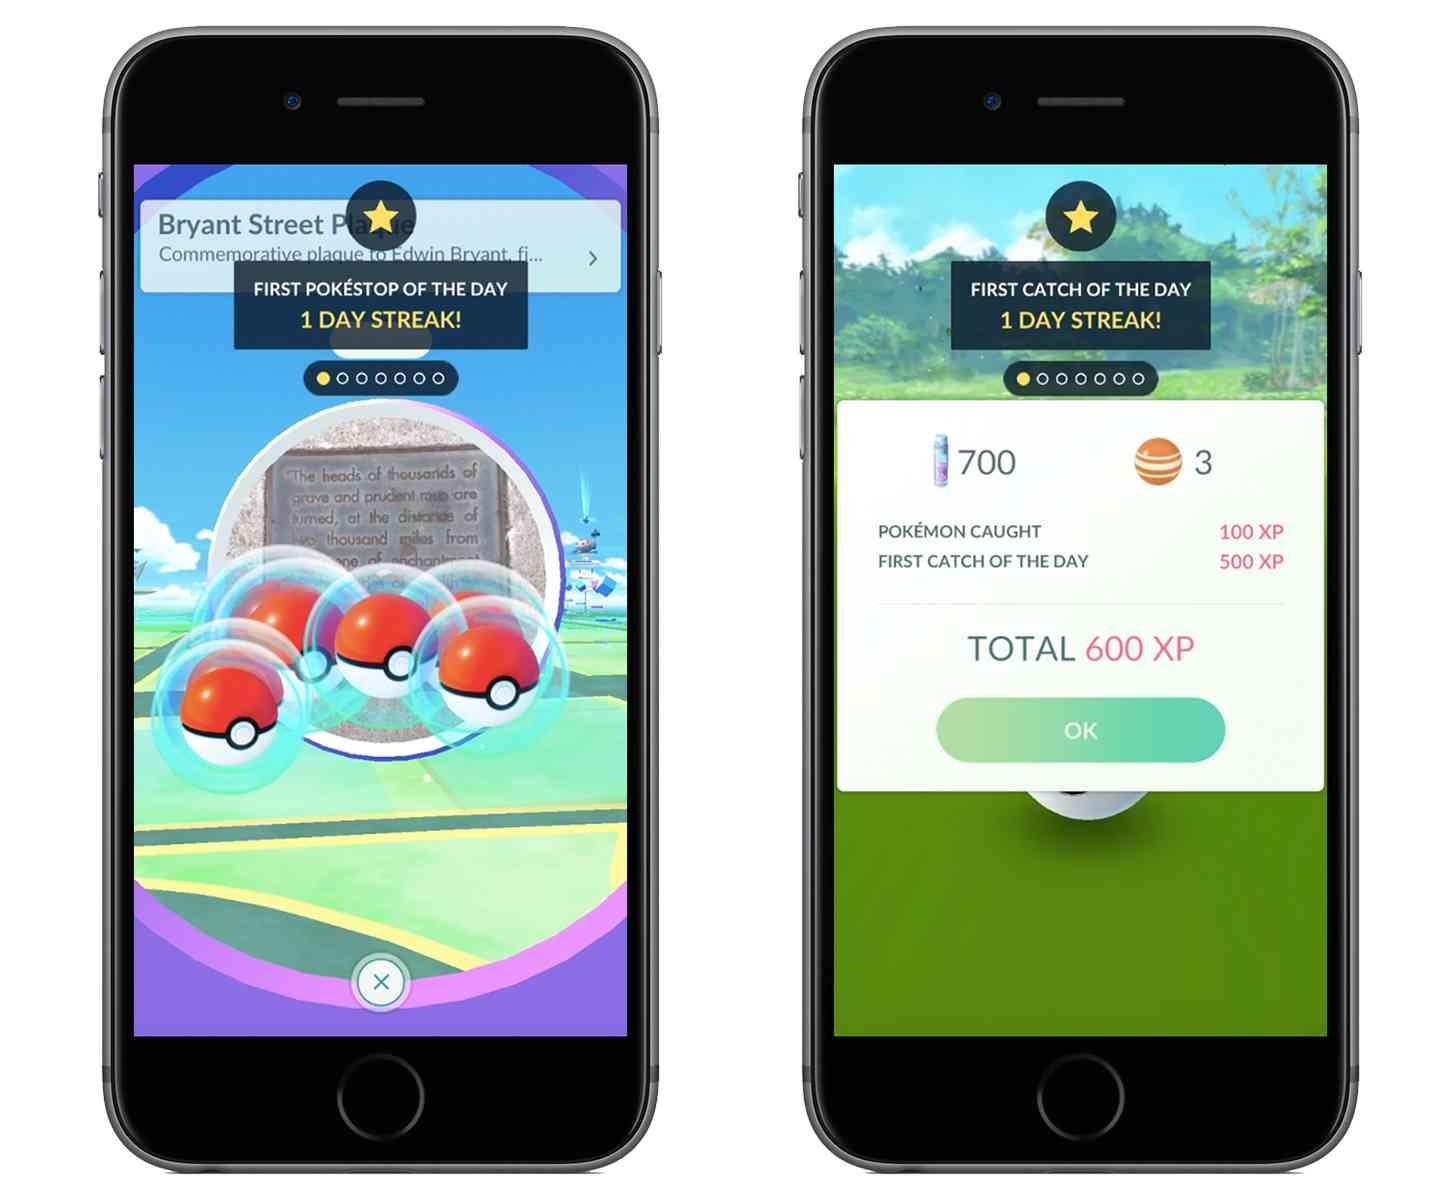 Pokémon Go daily bonuses